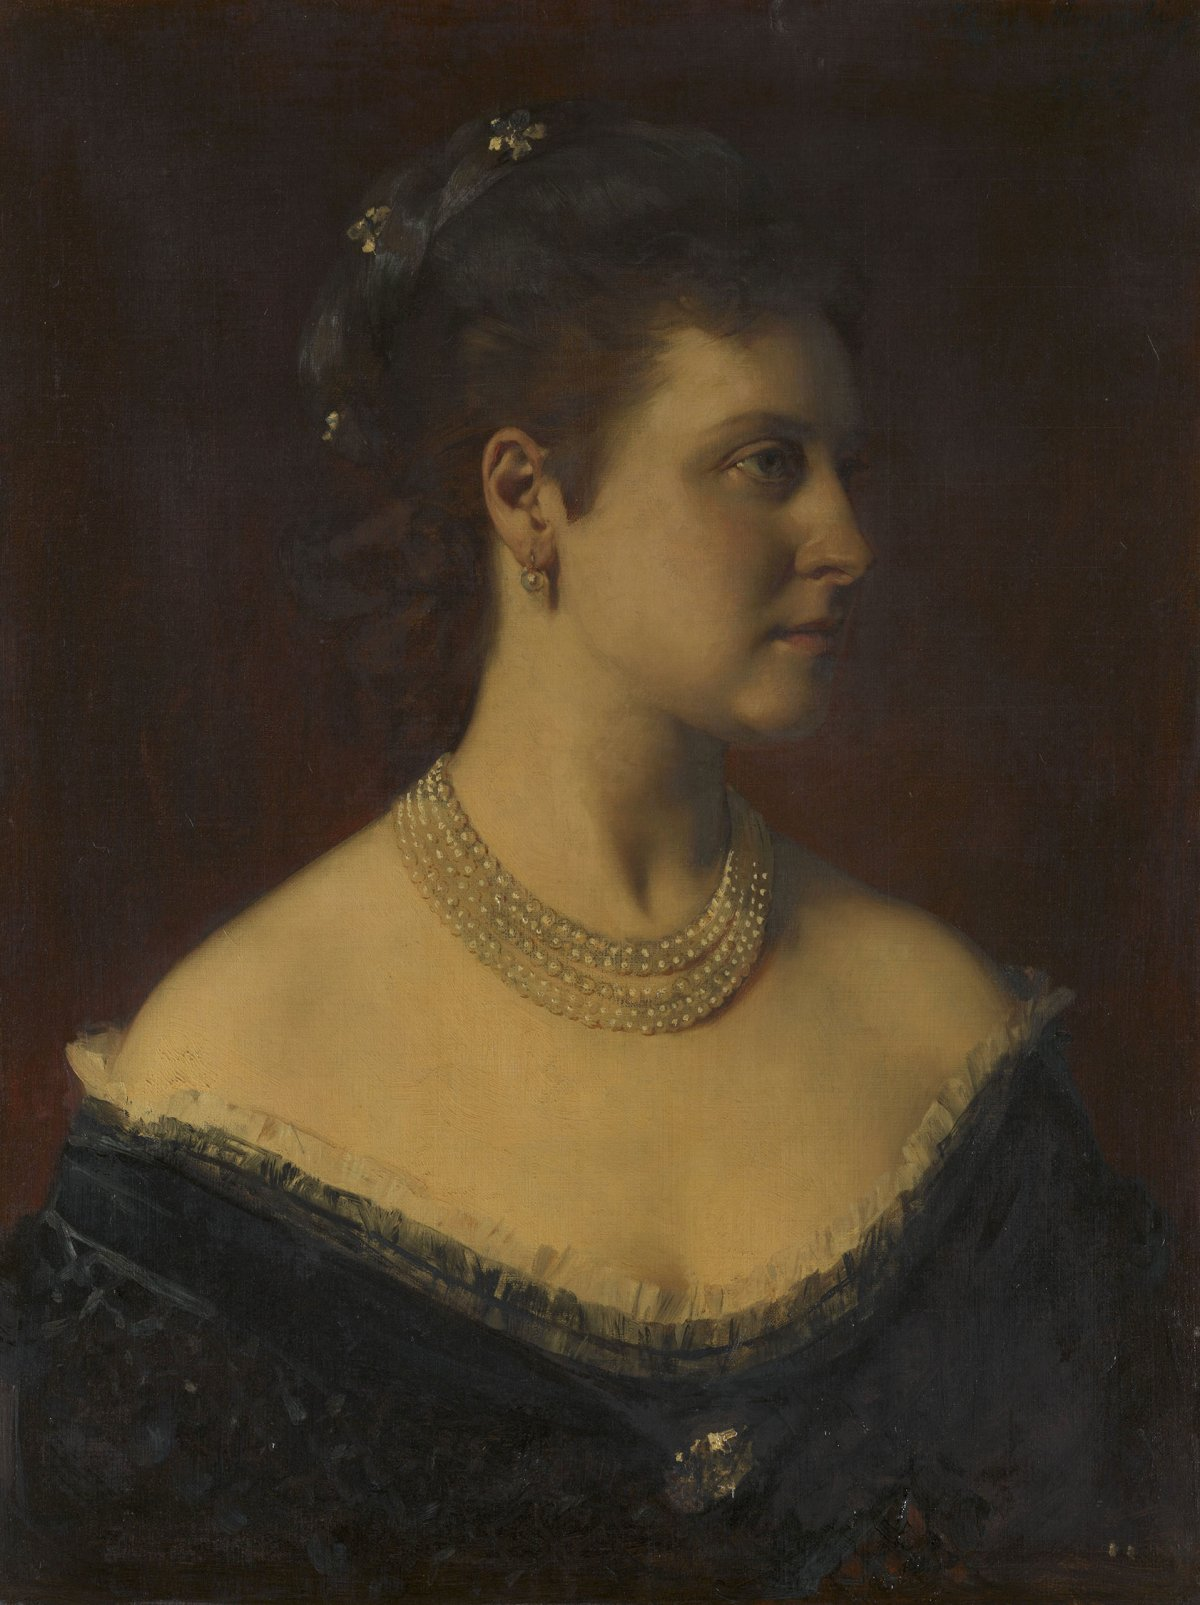 Princess Louise, Marchioness of Lorne, later Duchess of Argyll, by Heinrich von Angeli,1875